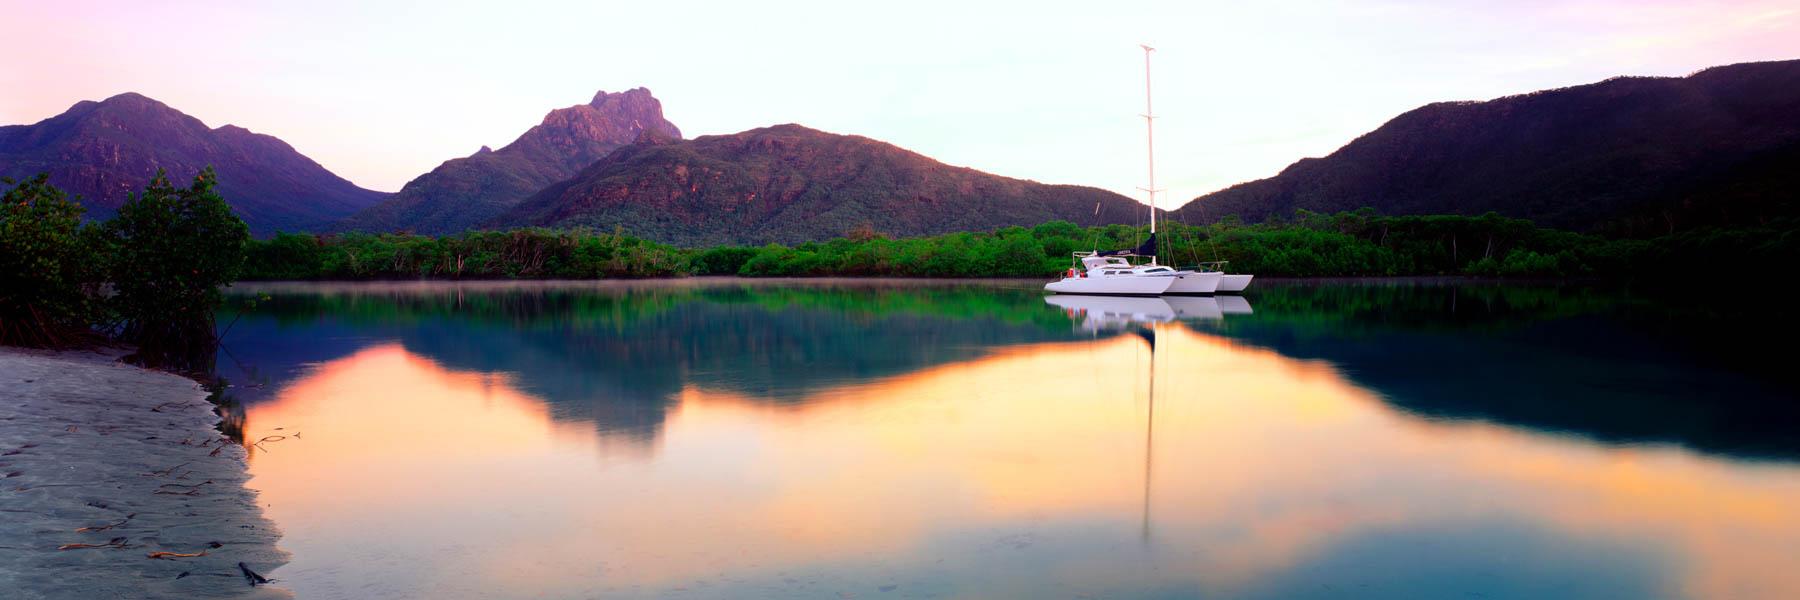 A yacht moored near Hinchinbrook Island, Qld, Australia.